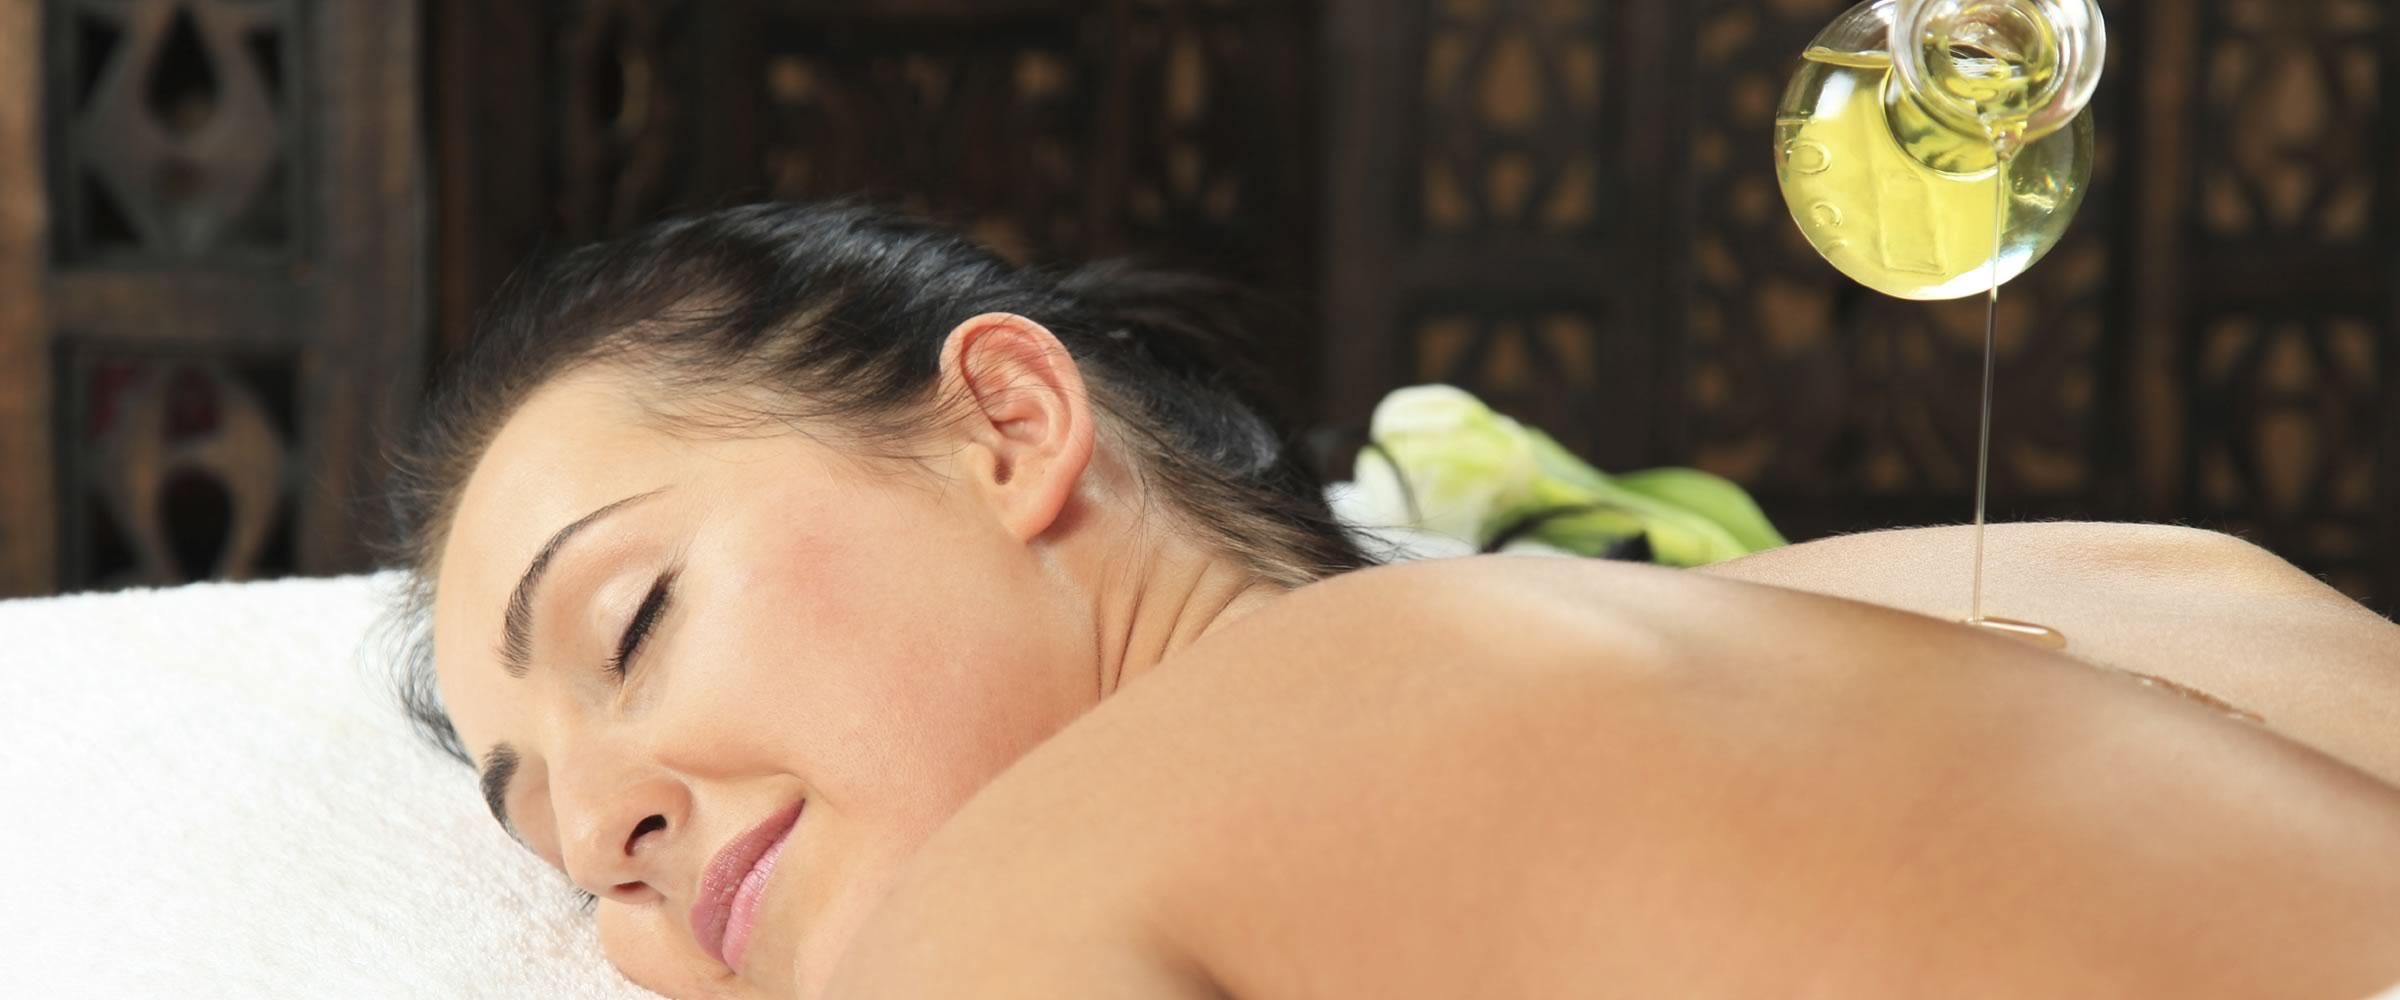 sexs gratis massage lisa amsterdam